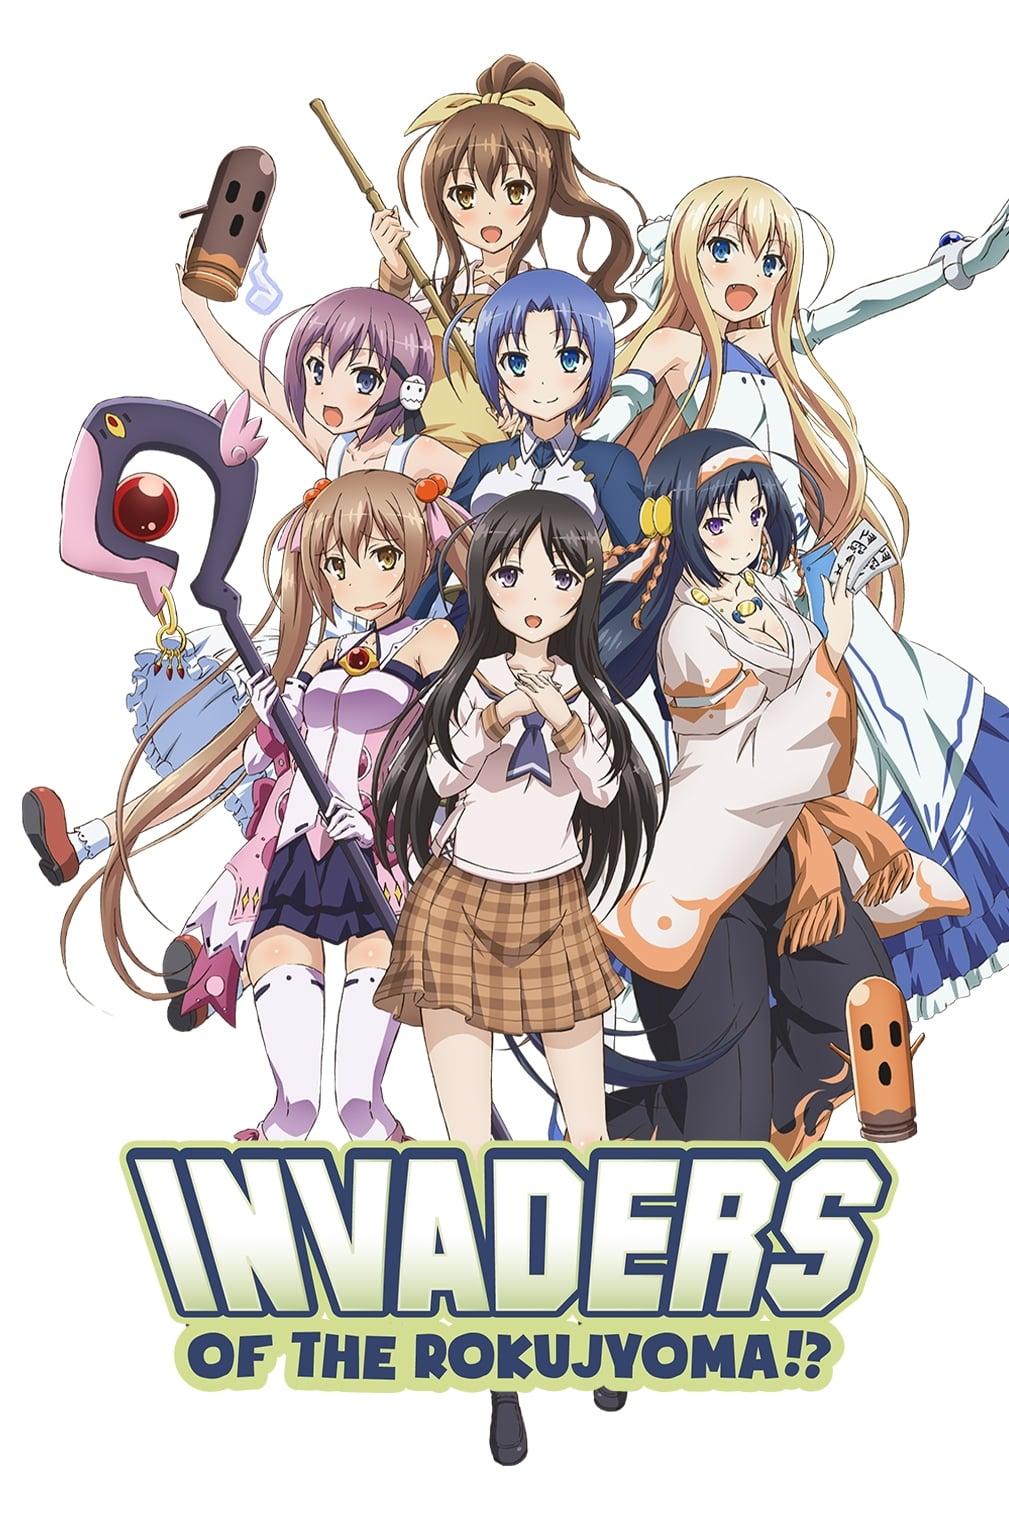 Invaders of the Rokujouma!?